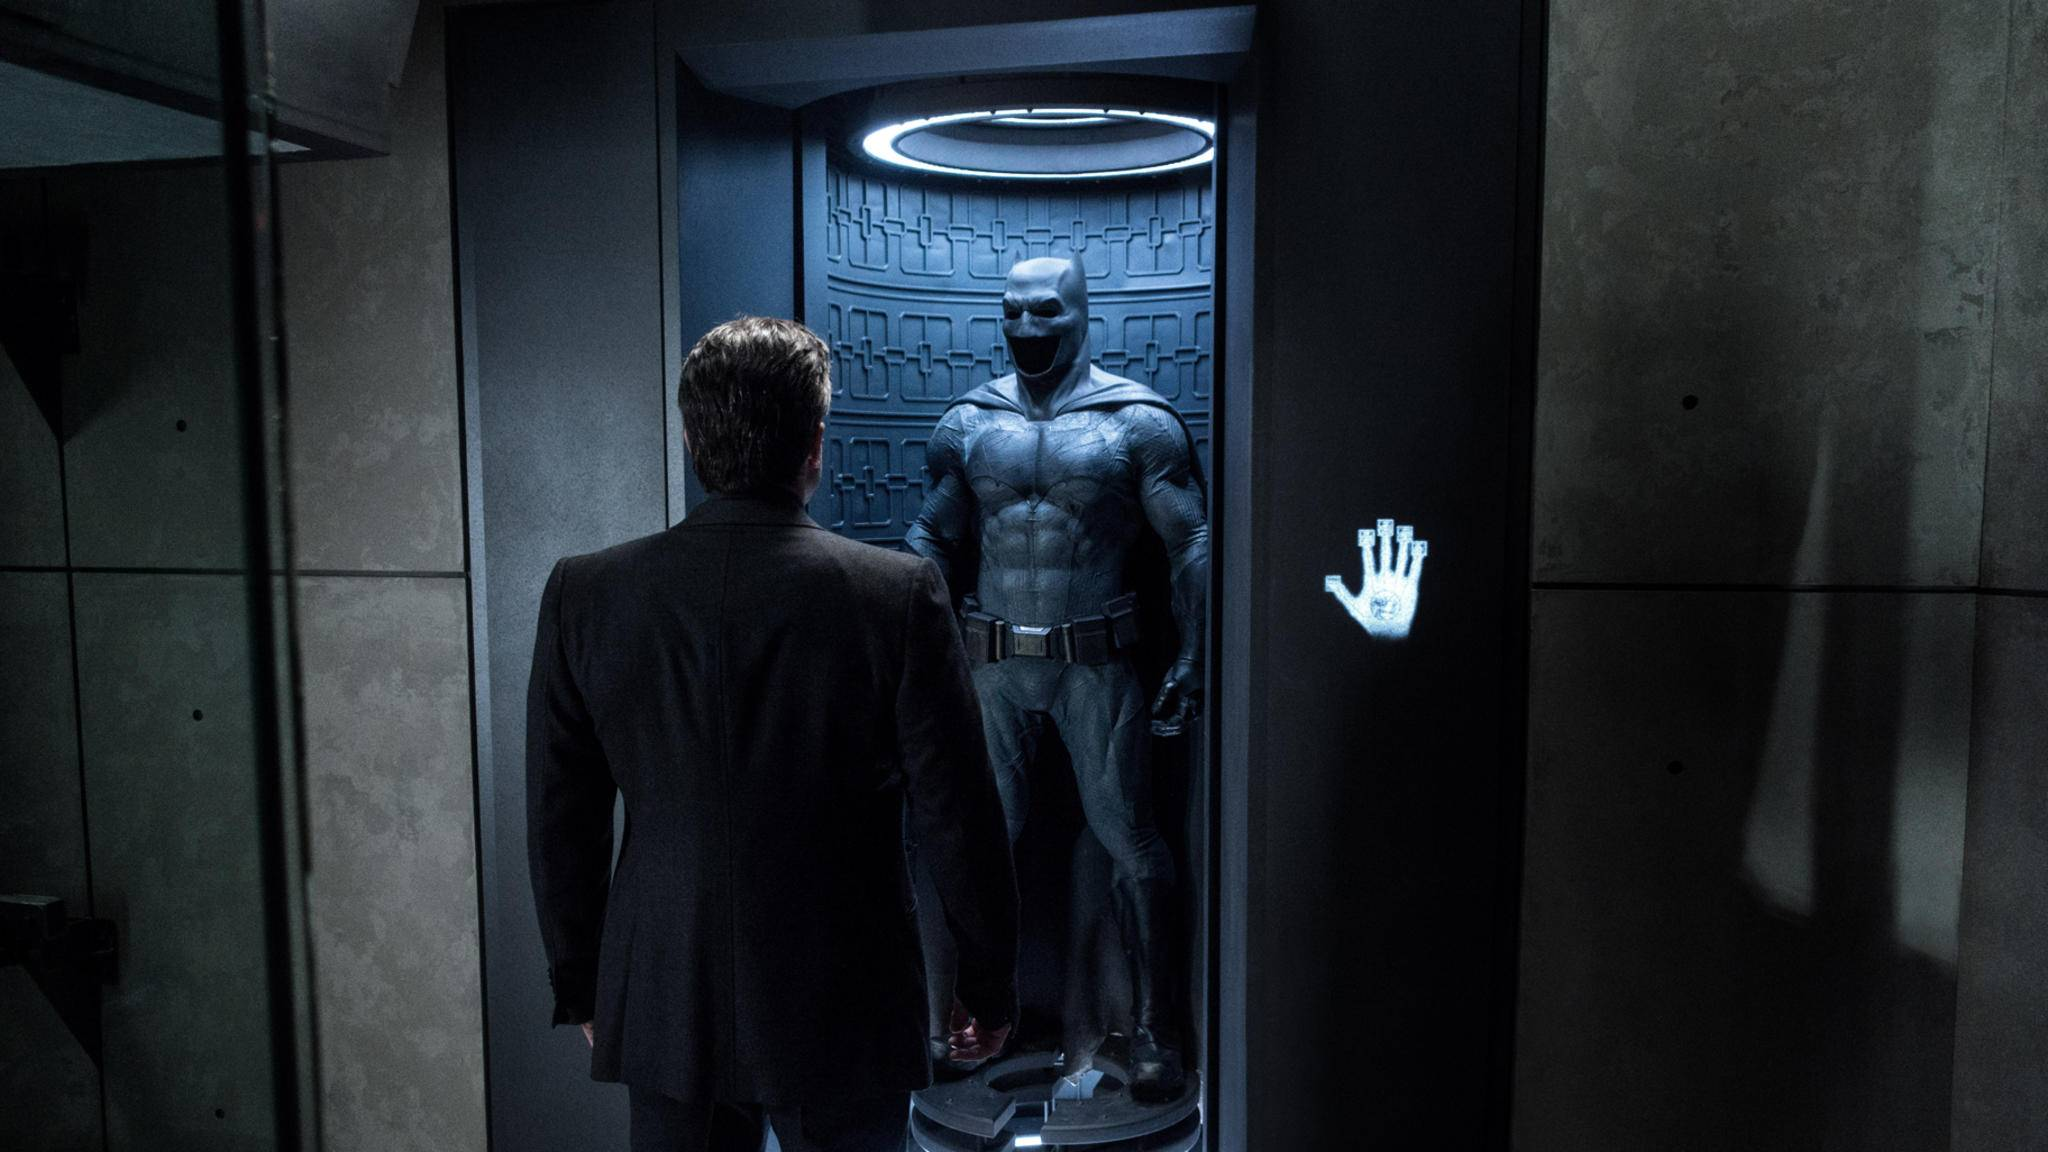 Wann sehen wir Batman wieder? Neues zum Drehbeginn.